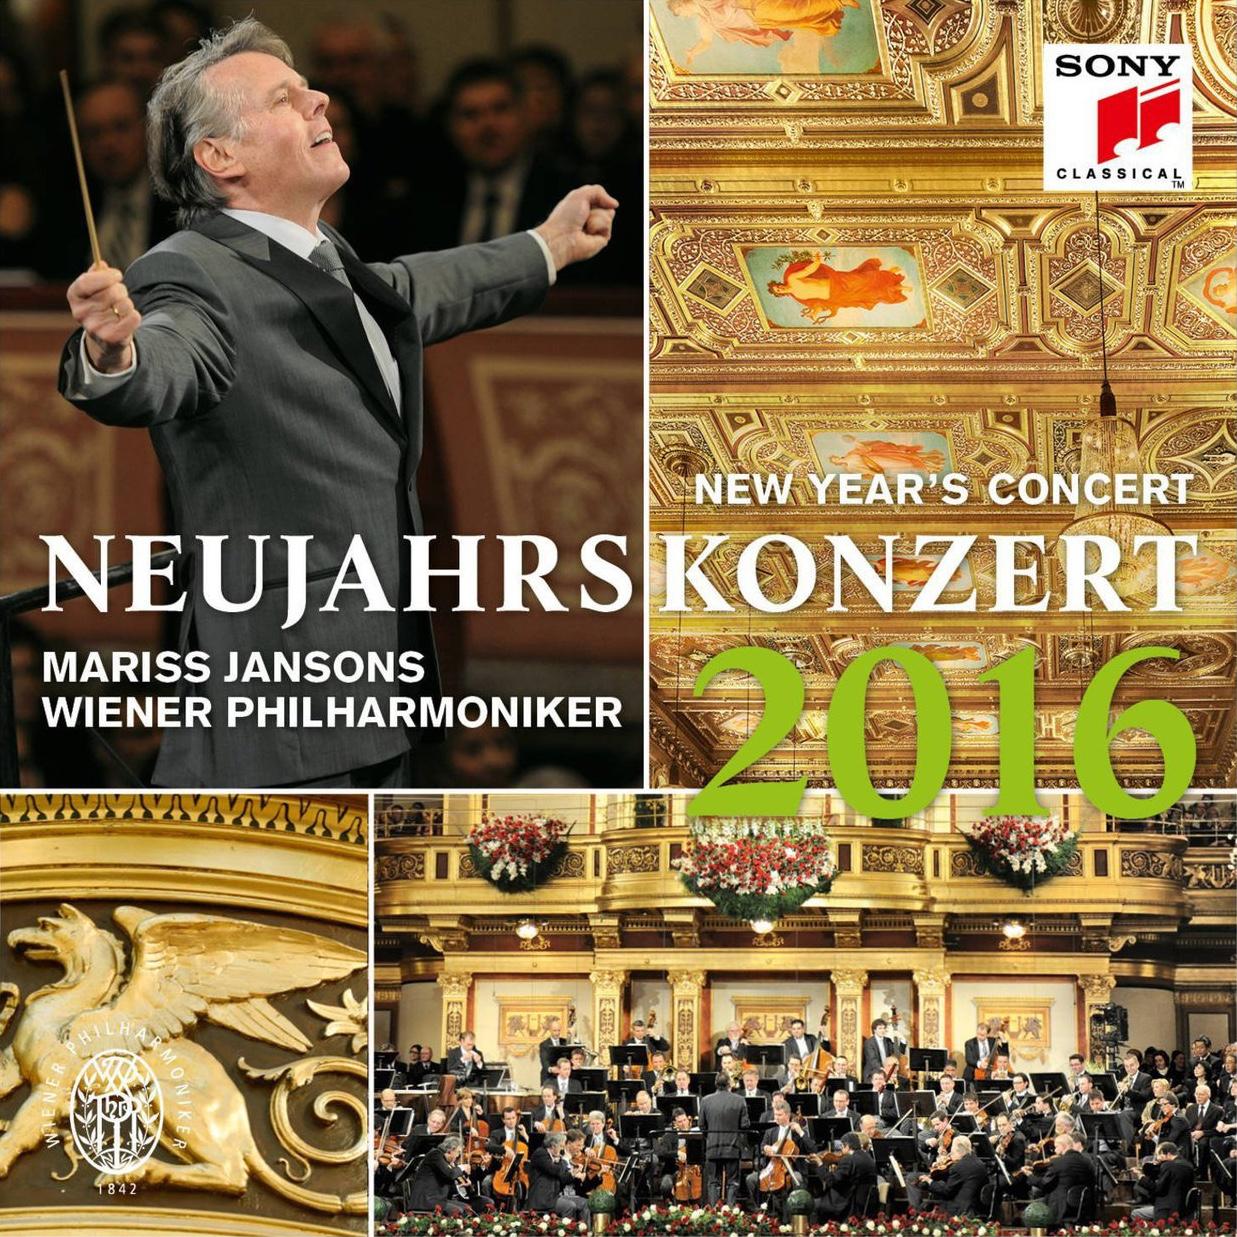 Wiener Philharmoniker Vienna New Year's Concert 2016